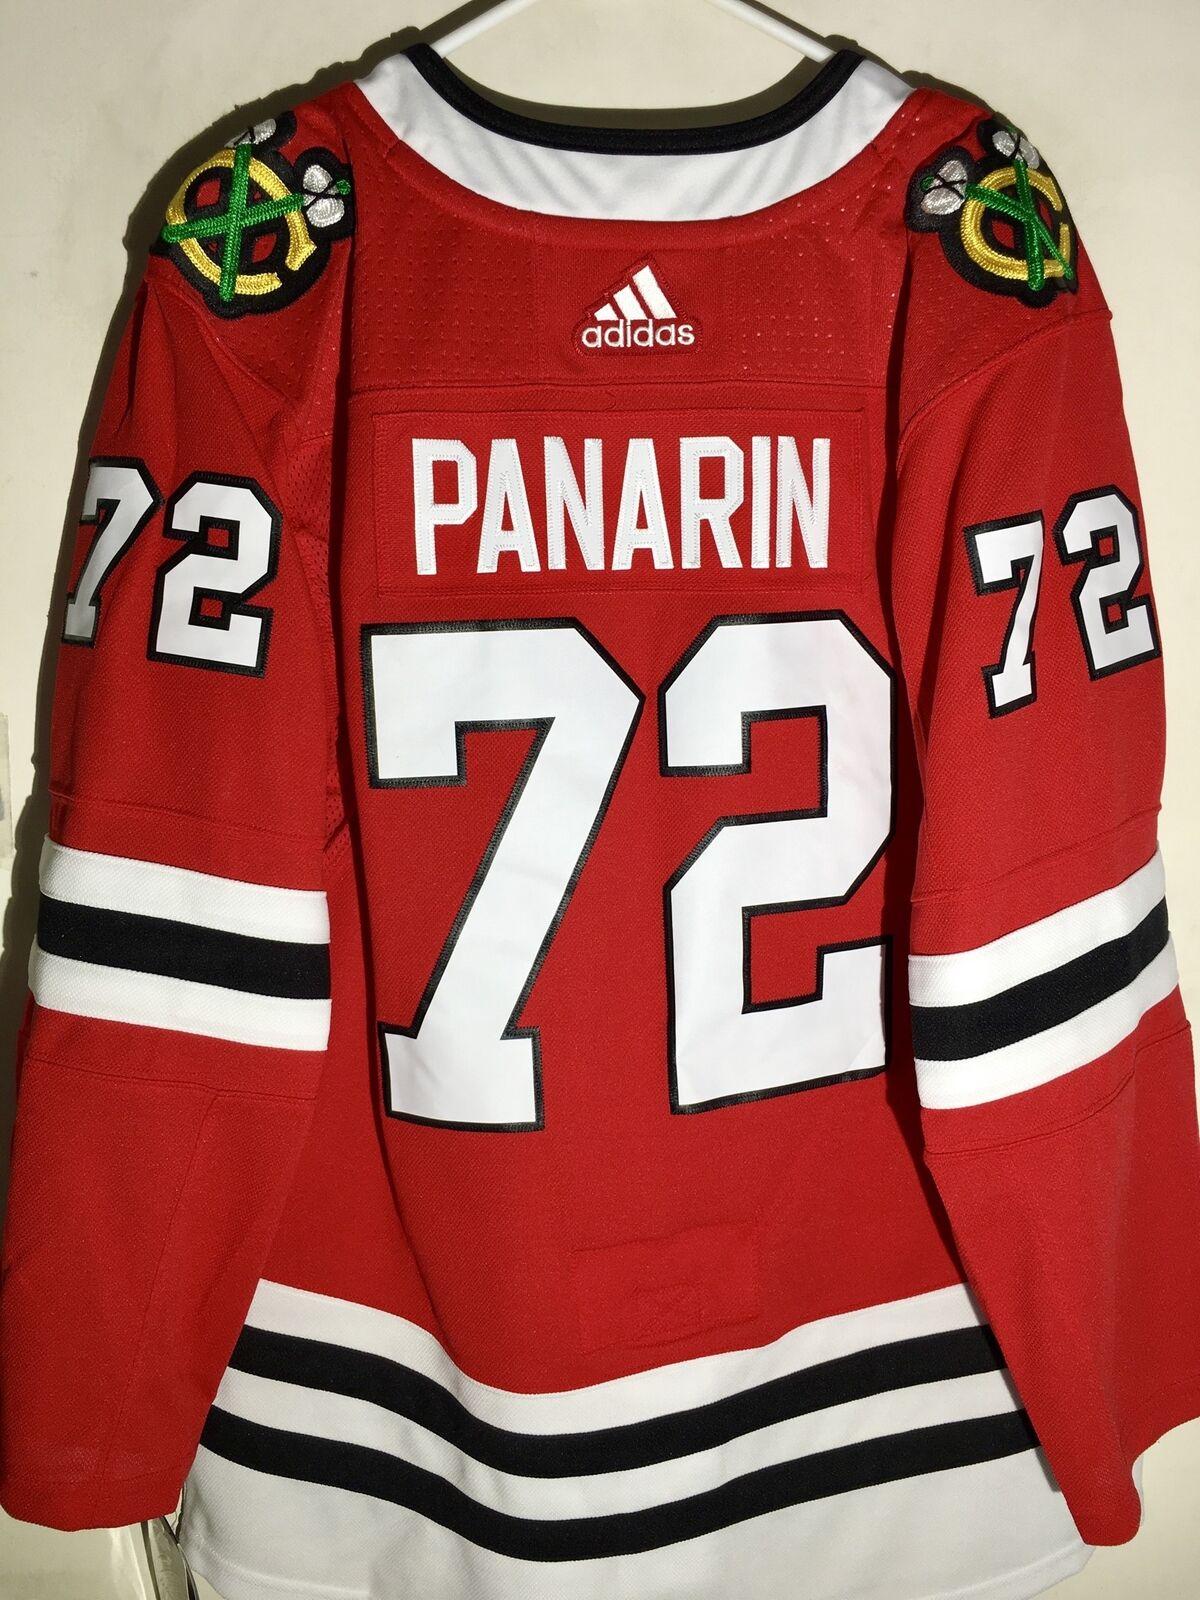 ef5f6222b0c8 adidas Authentic NHL Jersey Chicago Blackhawks Artemi Panarin Red sz sz sz  54 a25822